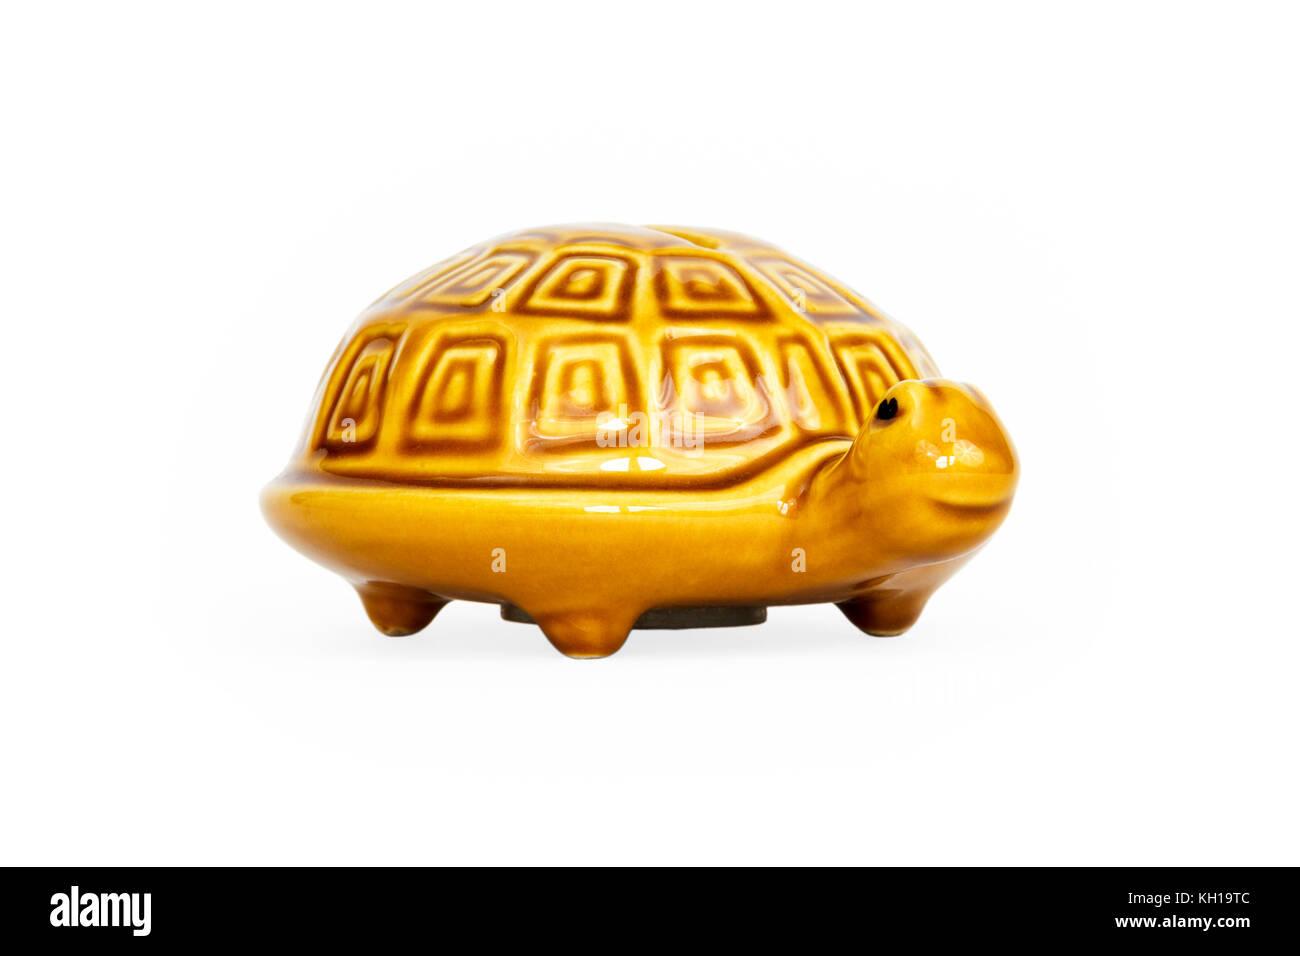 A glazed yellow or orange ceramic tortoise money box, against a white background - Stock Image